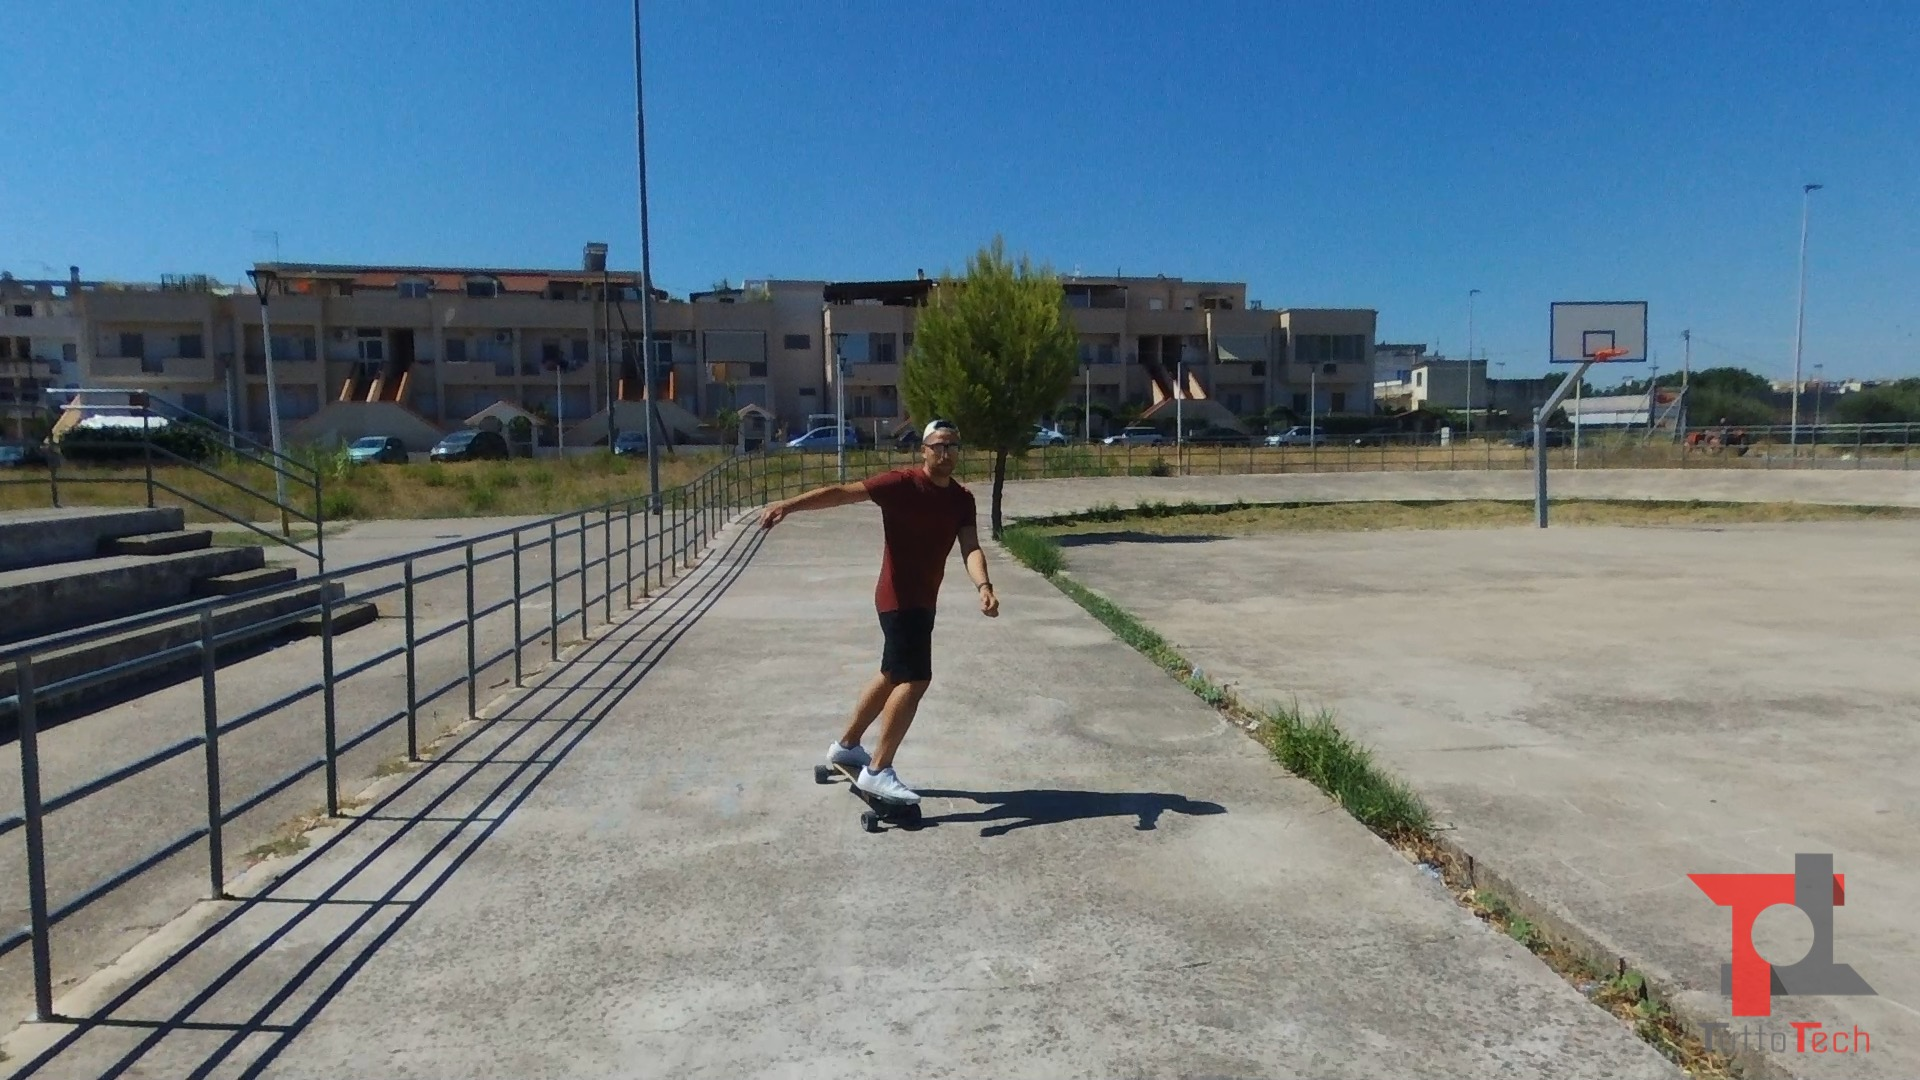 Recensione Ownboard W1S: il best buy degli skateboard elettrici 4